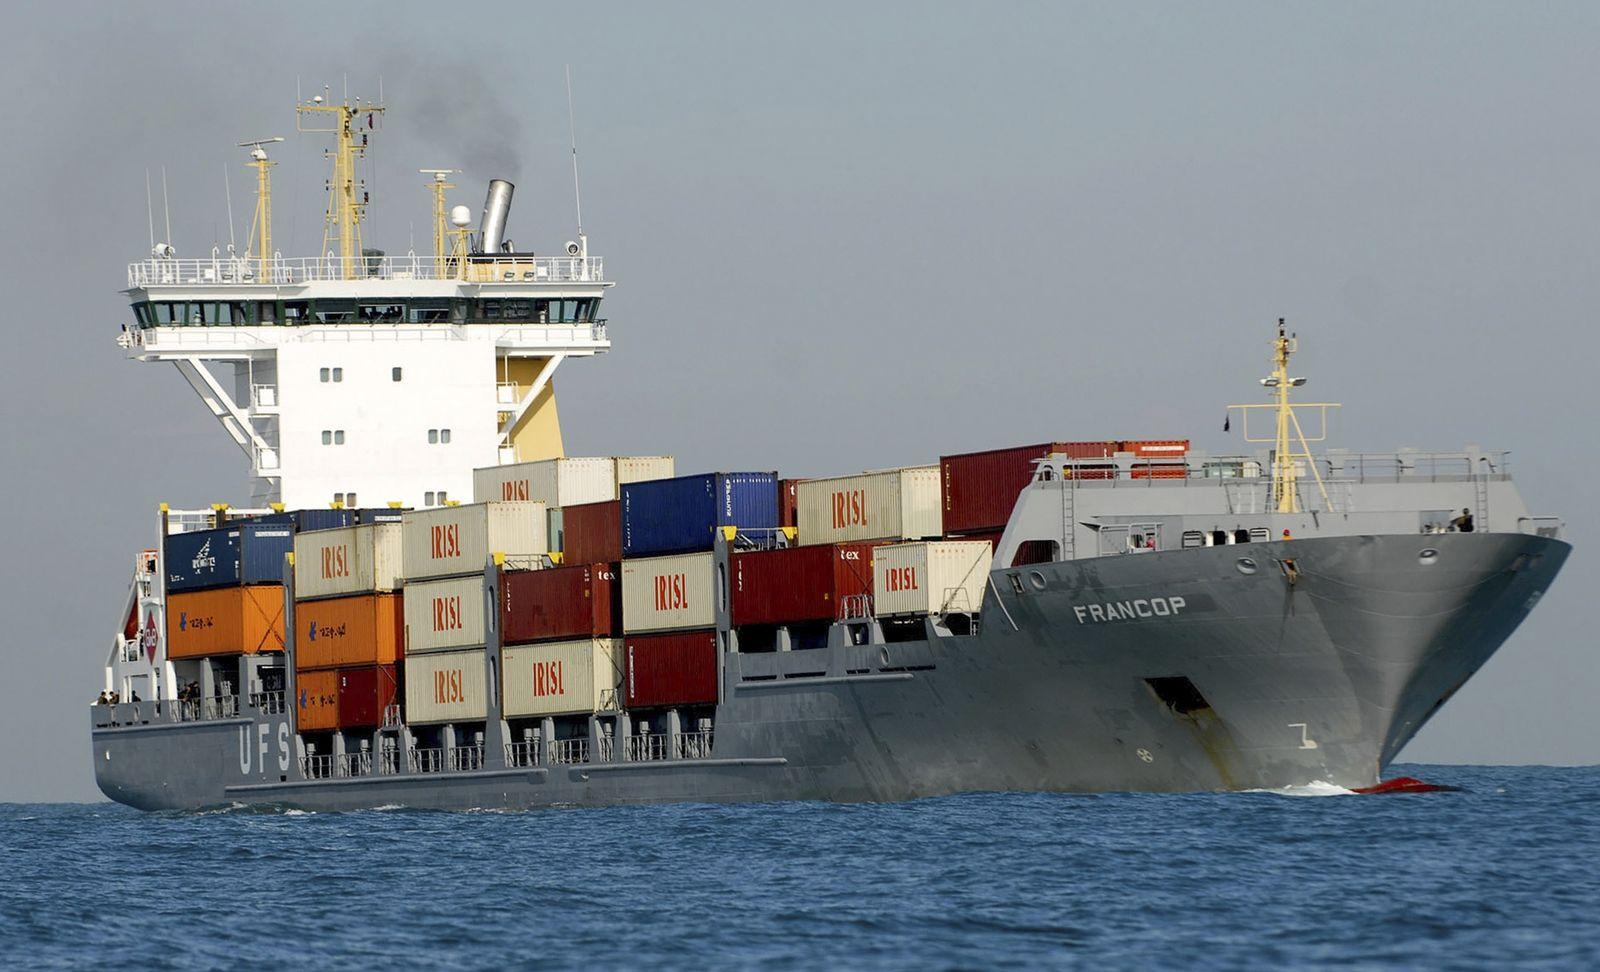 Francop ship